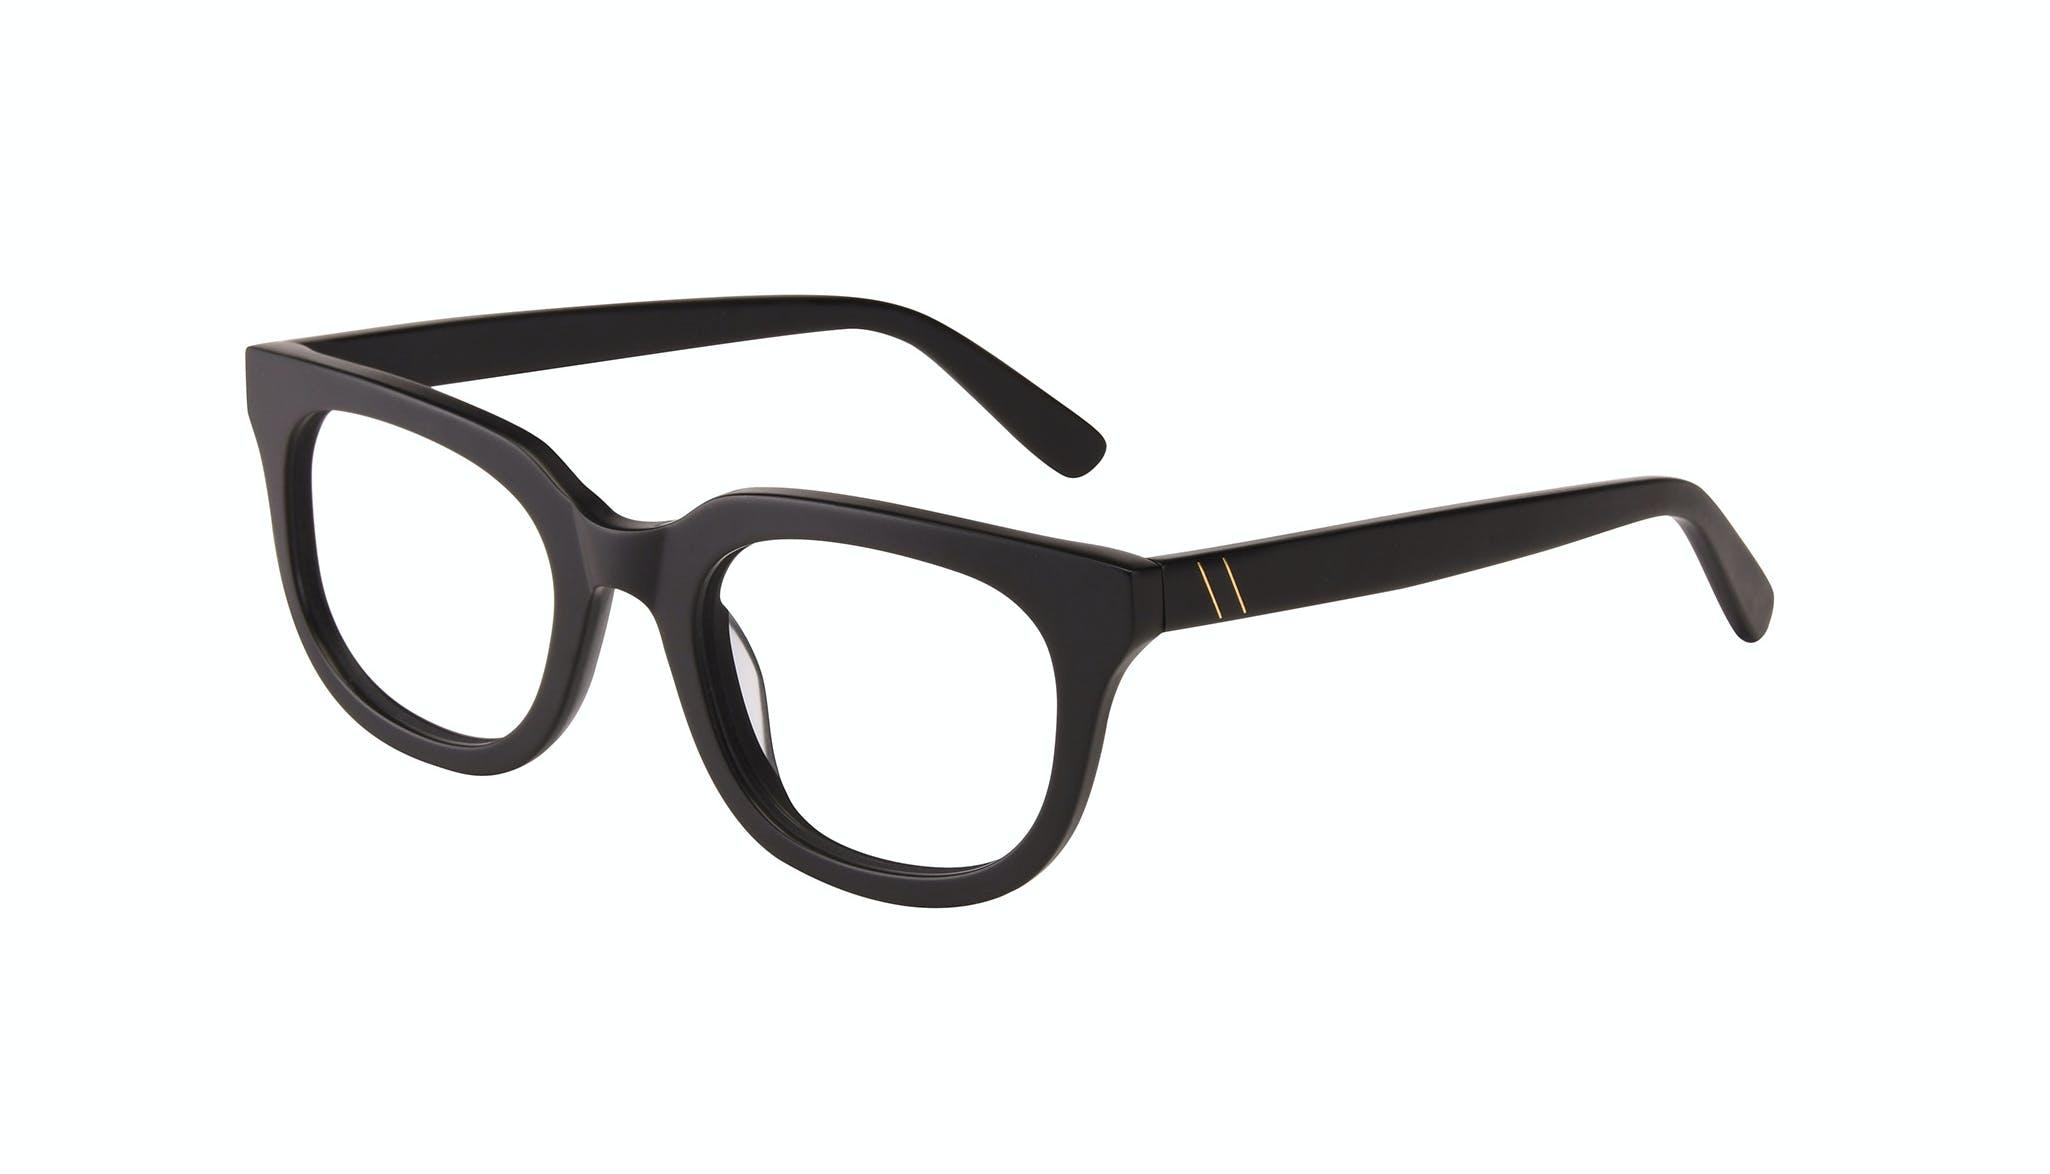 Affordable Fashion Glasses Square Eyeglasses Men Stout Matte Black Tilt